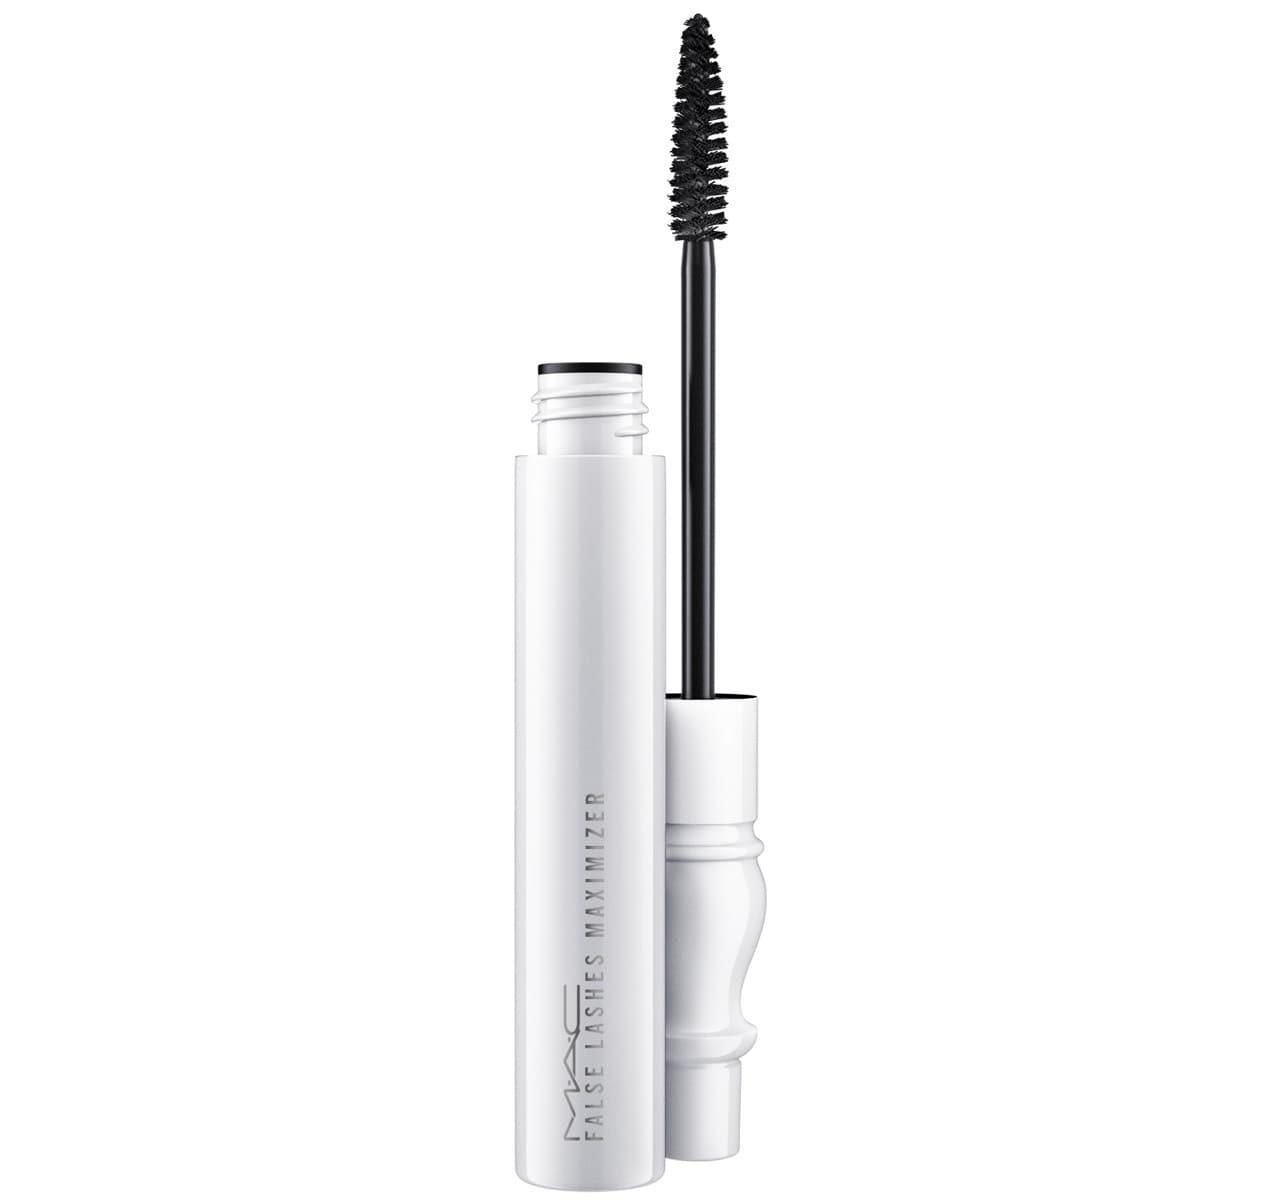 False Lashes Maximizer Mac Cosmetics Official Site